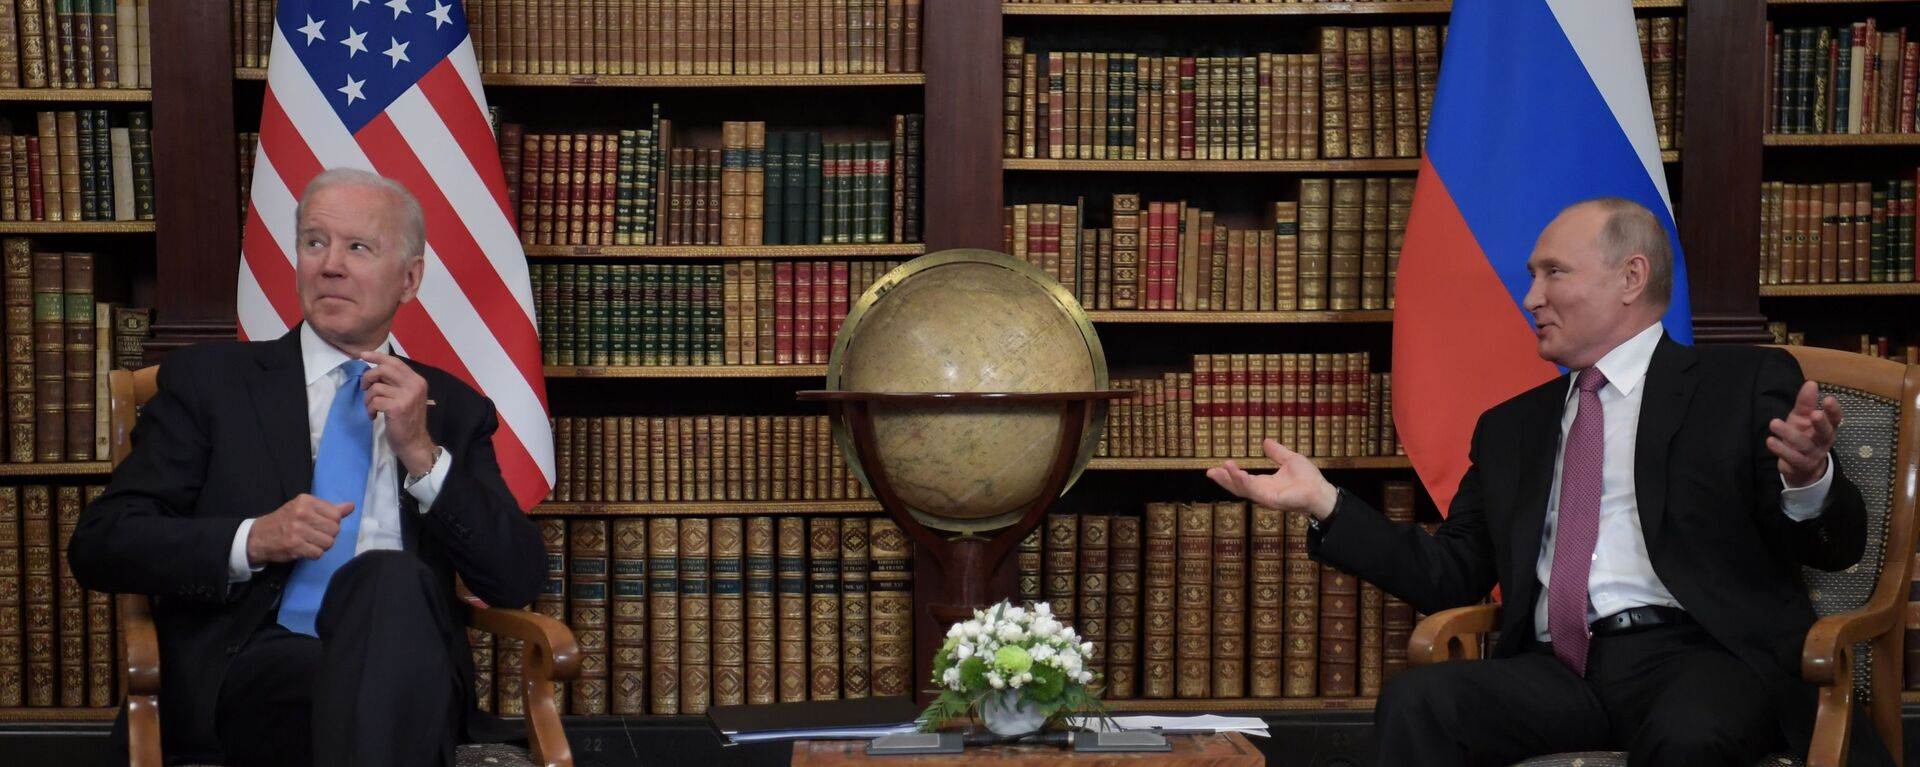 Prezidenti USA a Ruska Joe Biden a Vladimir Putin v Ženevě - Sputnik Česká republika, 1920, 16.06.2021